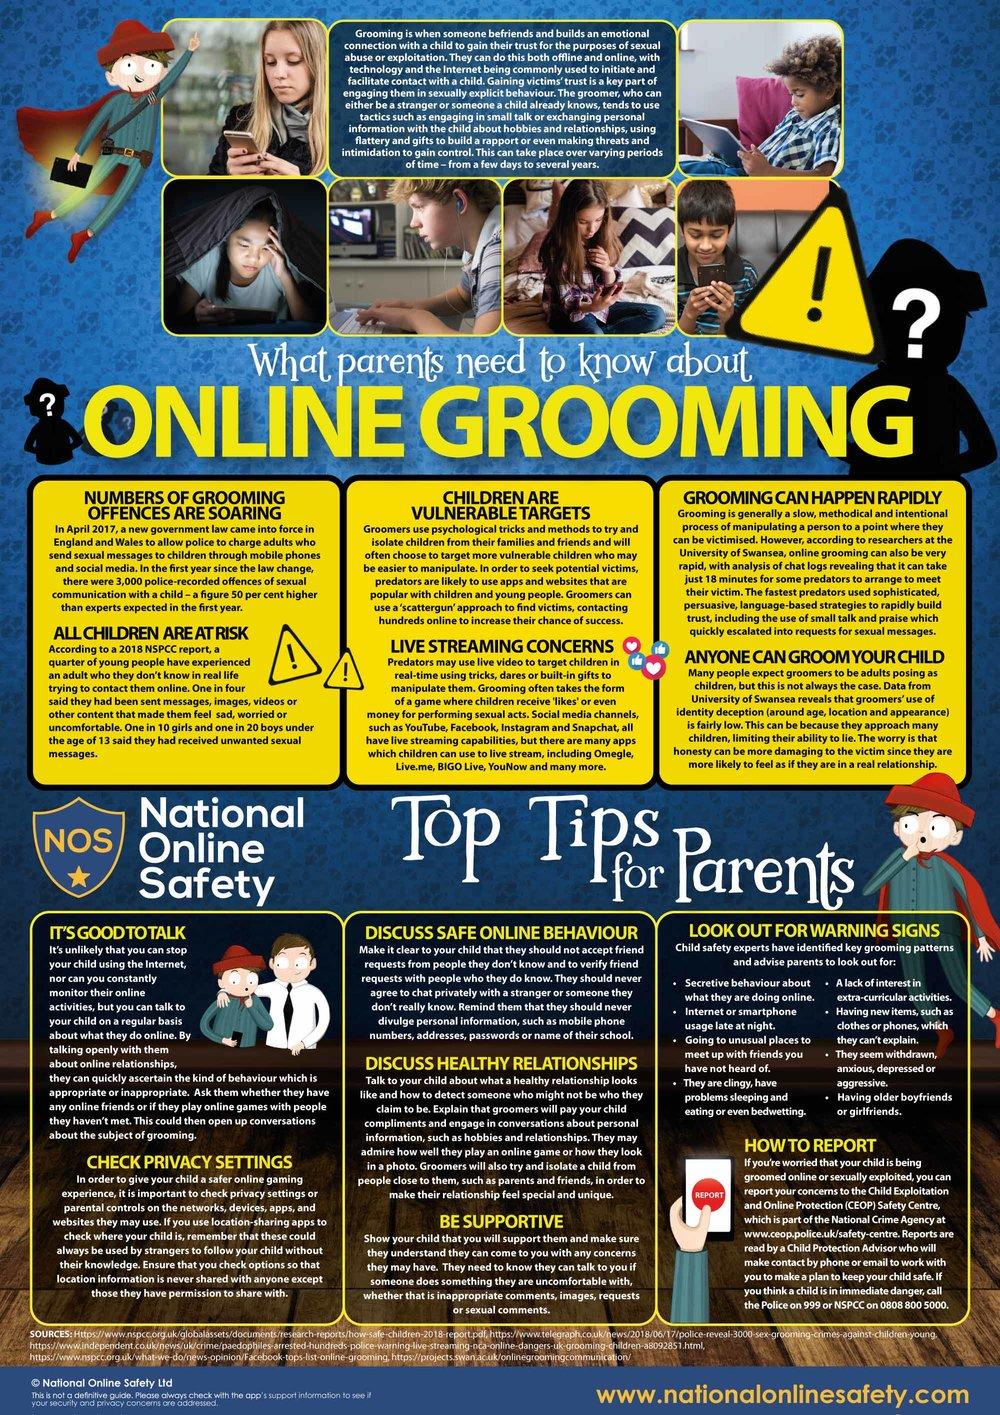 National Online Safety  Guide https://nationalonlinesafety.com/resources/platform-guides/